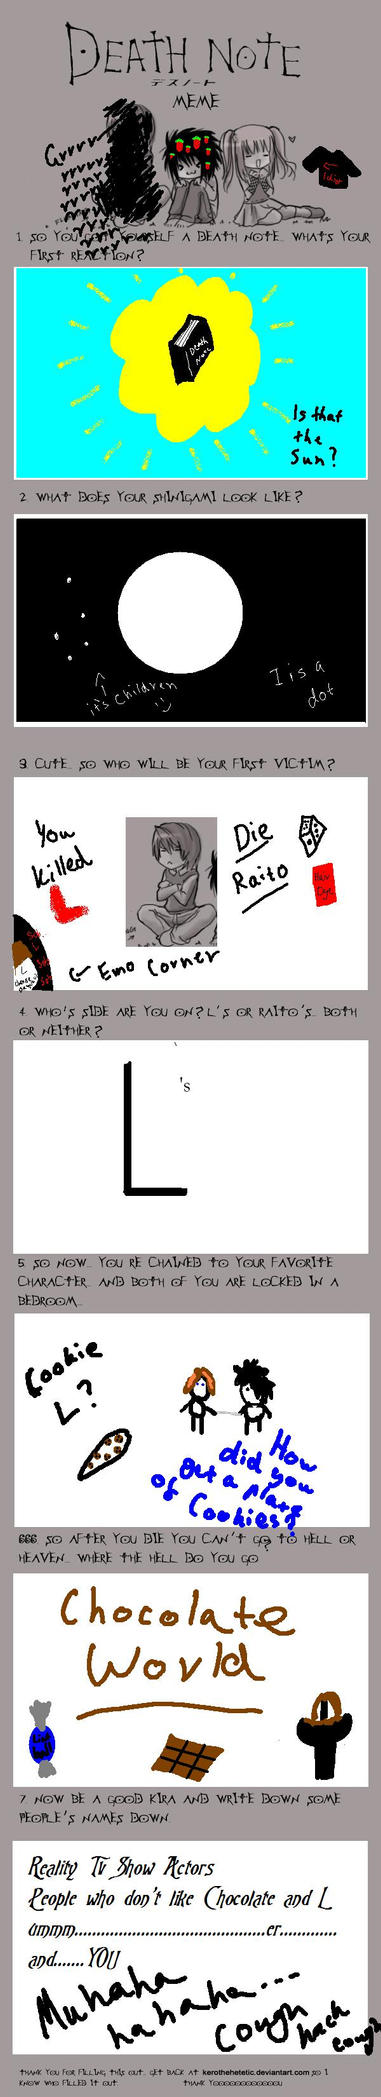 Death Note Meme by OwlsRuleThisWorld